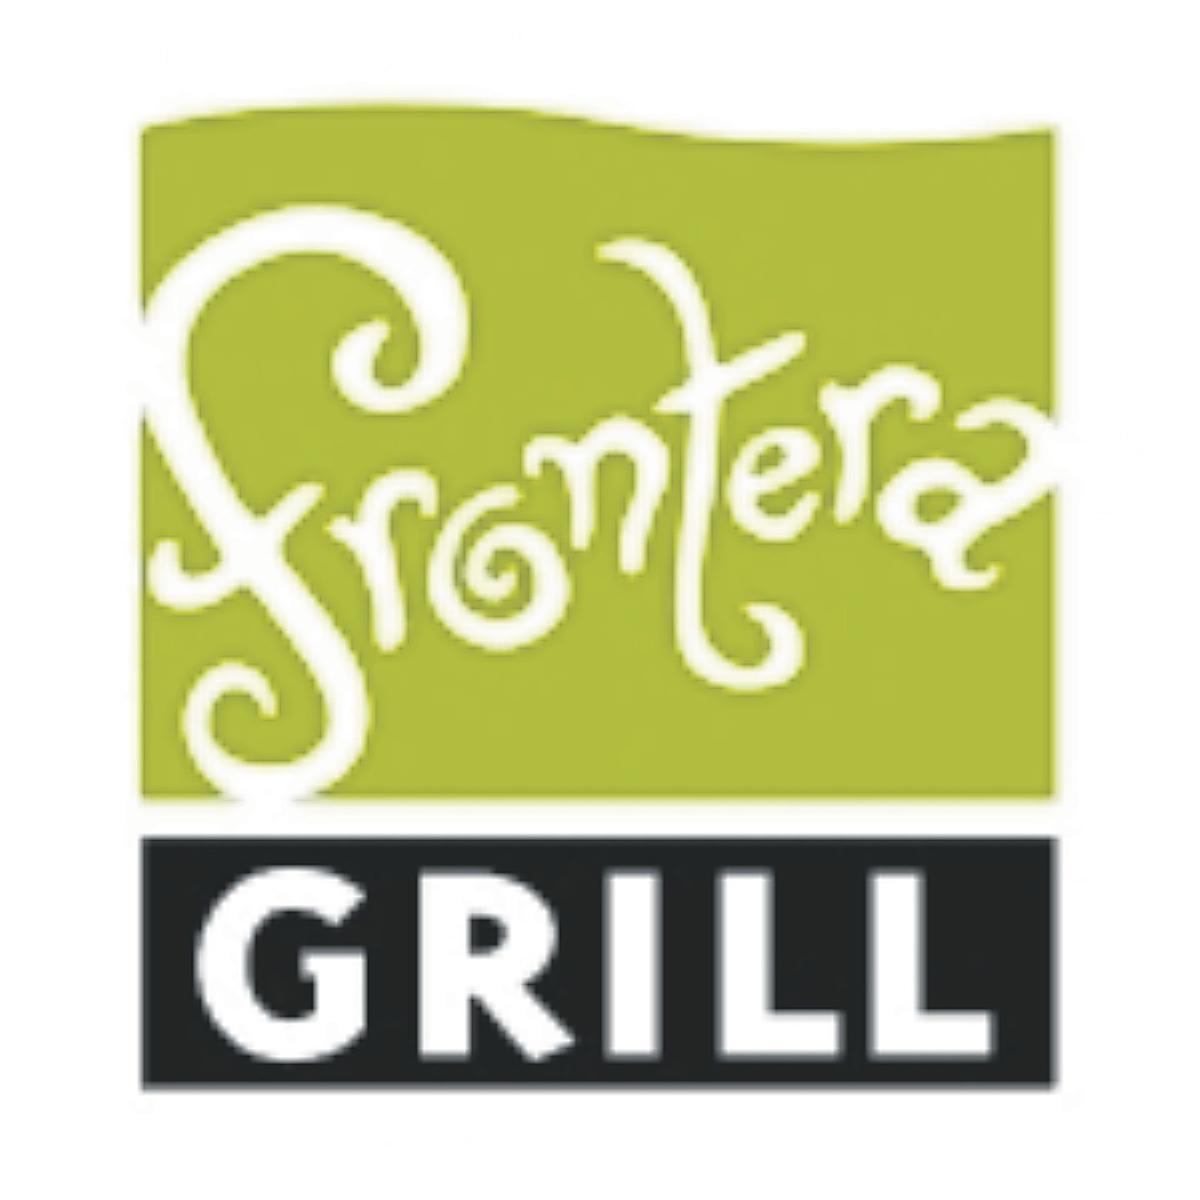 New restaurant in Buckland area